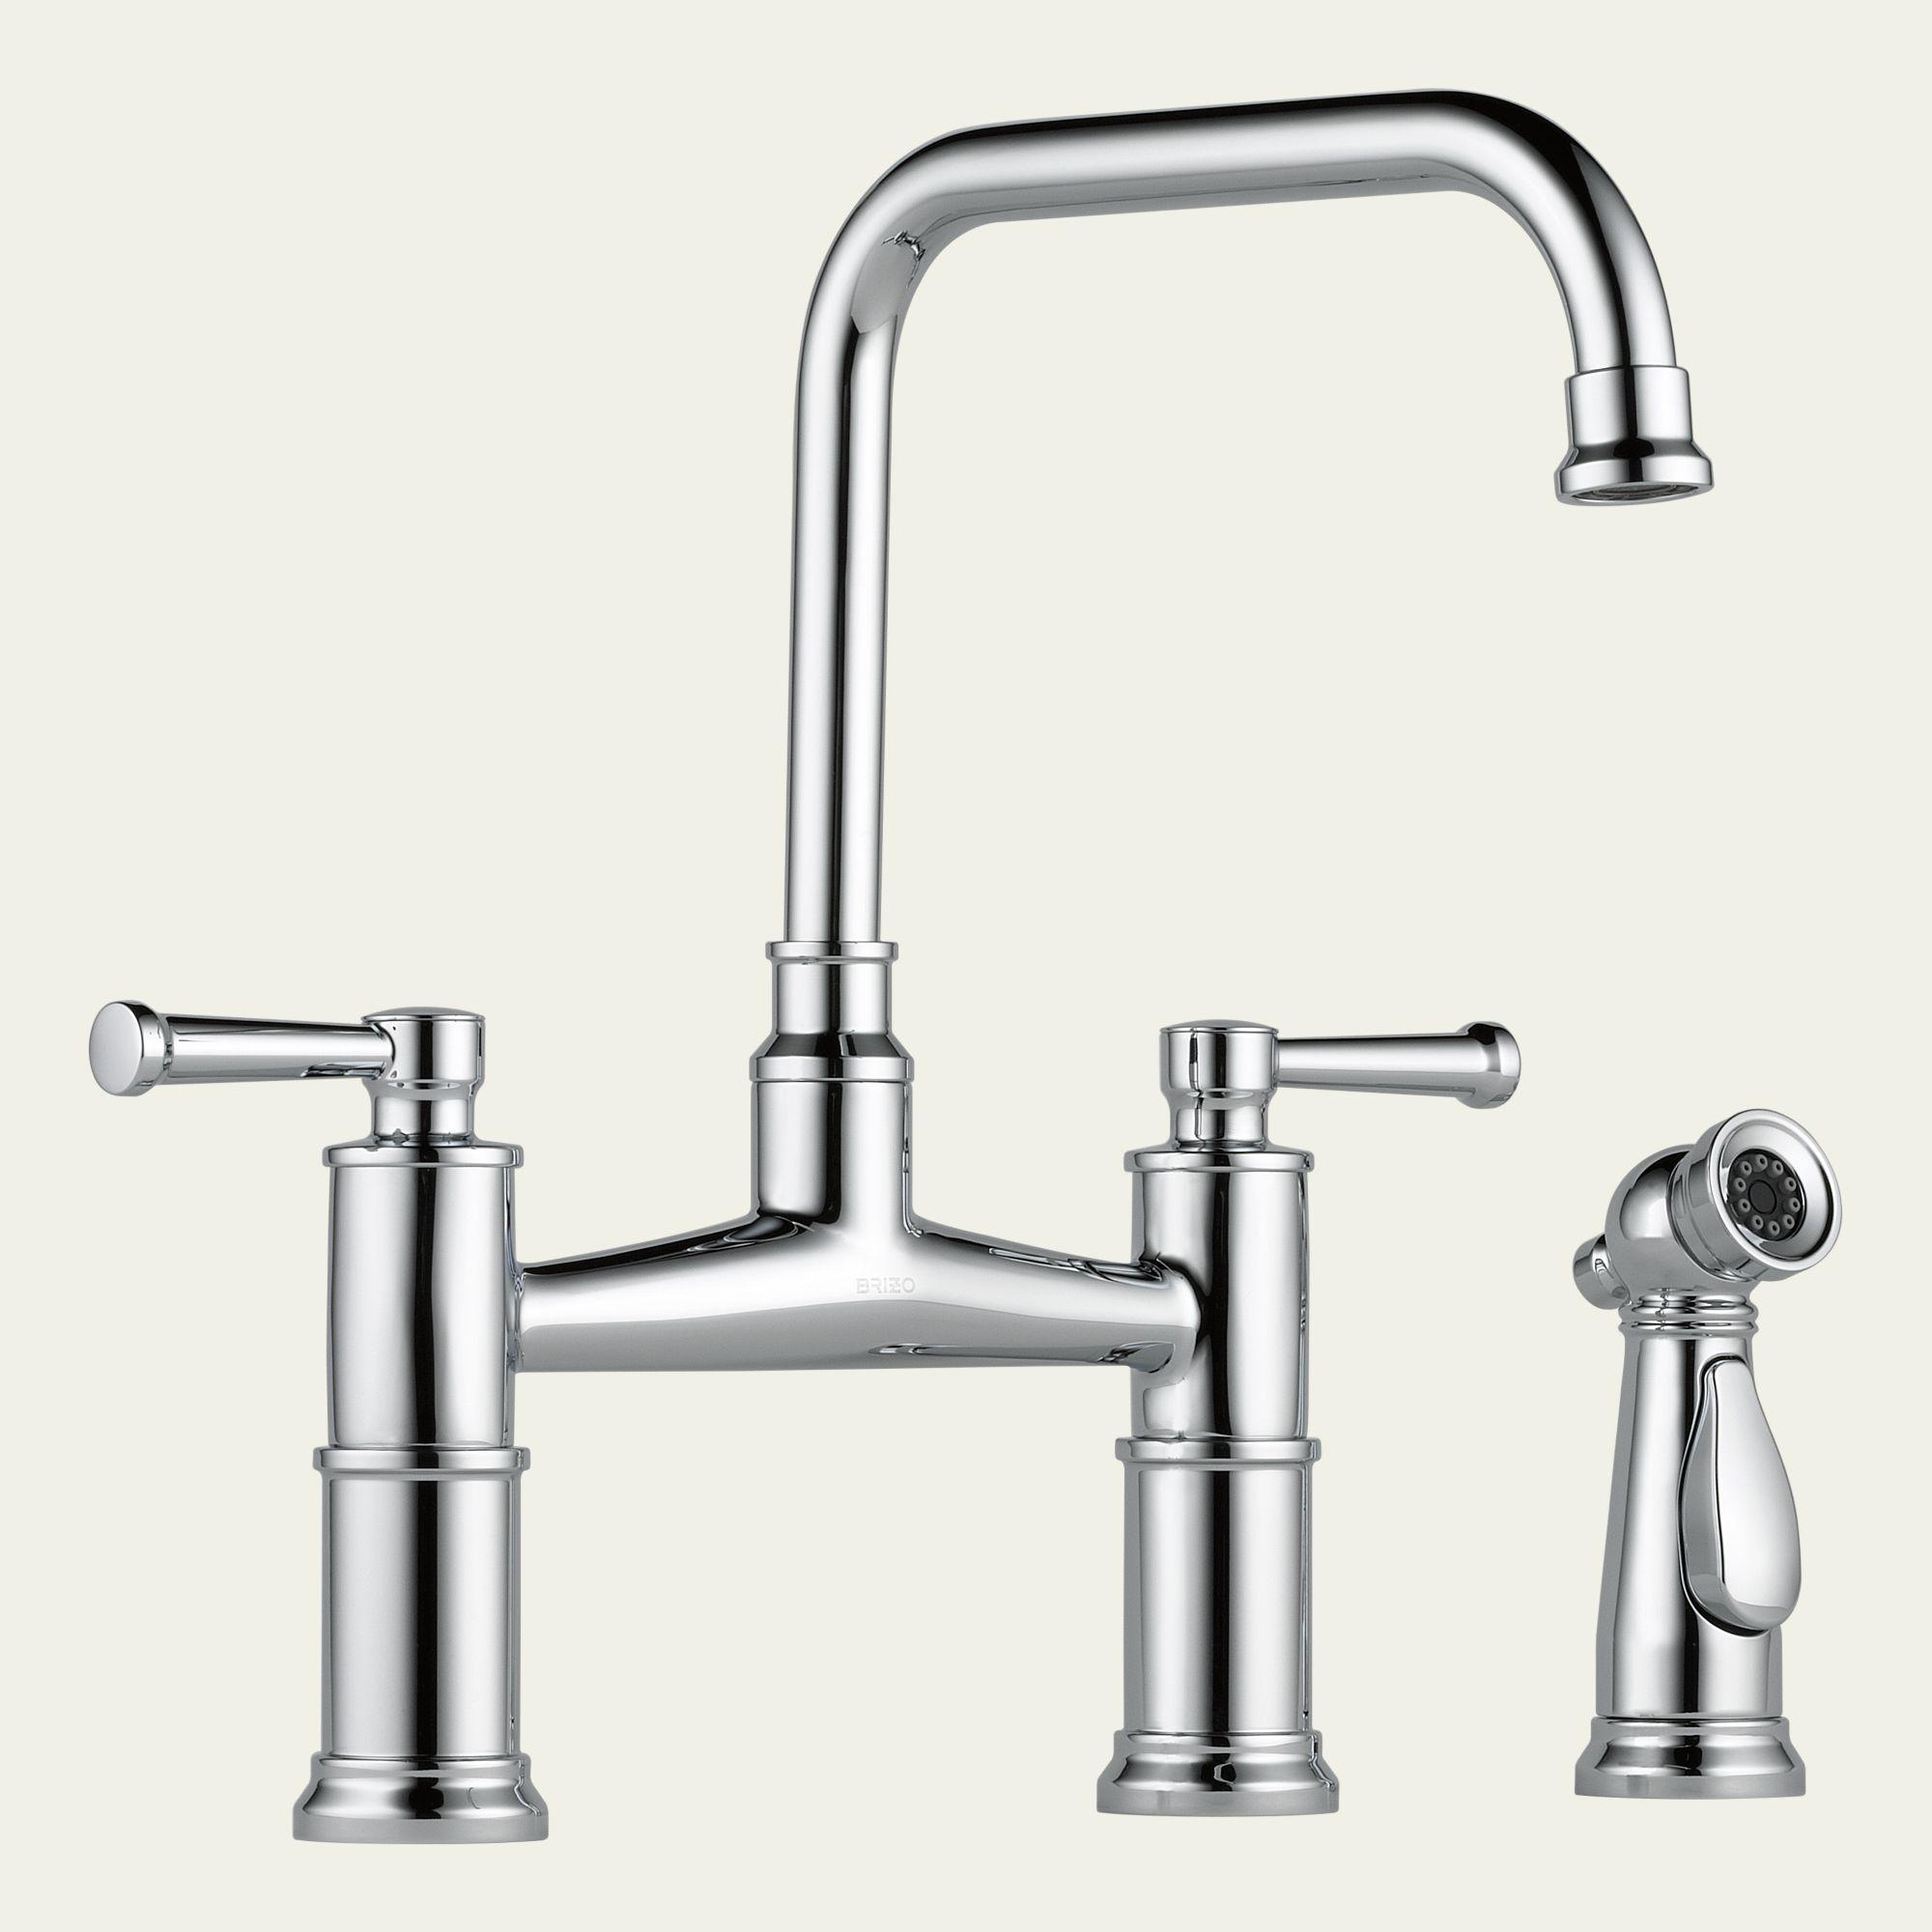 62525LF Brizo Two Handle Bridge Kitchen Faucet with Spray